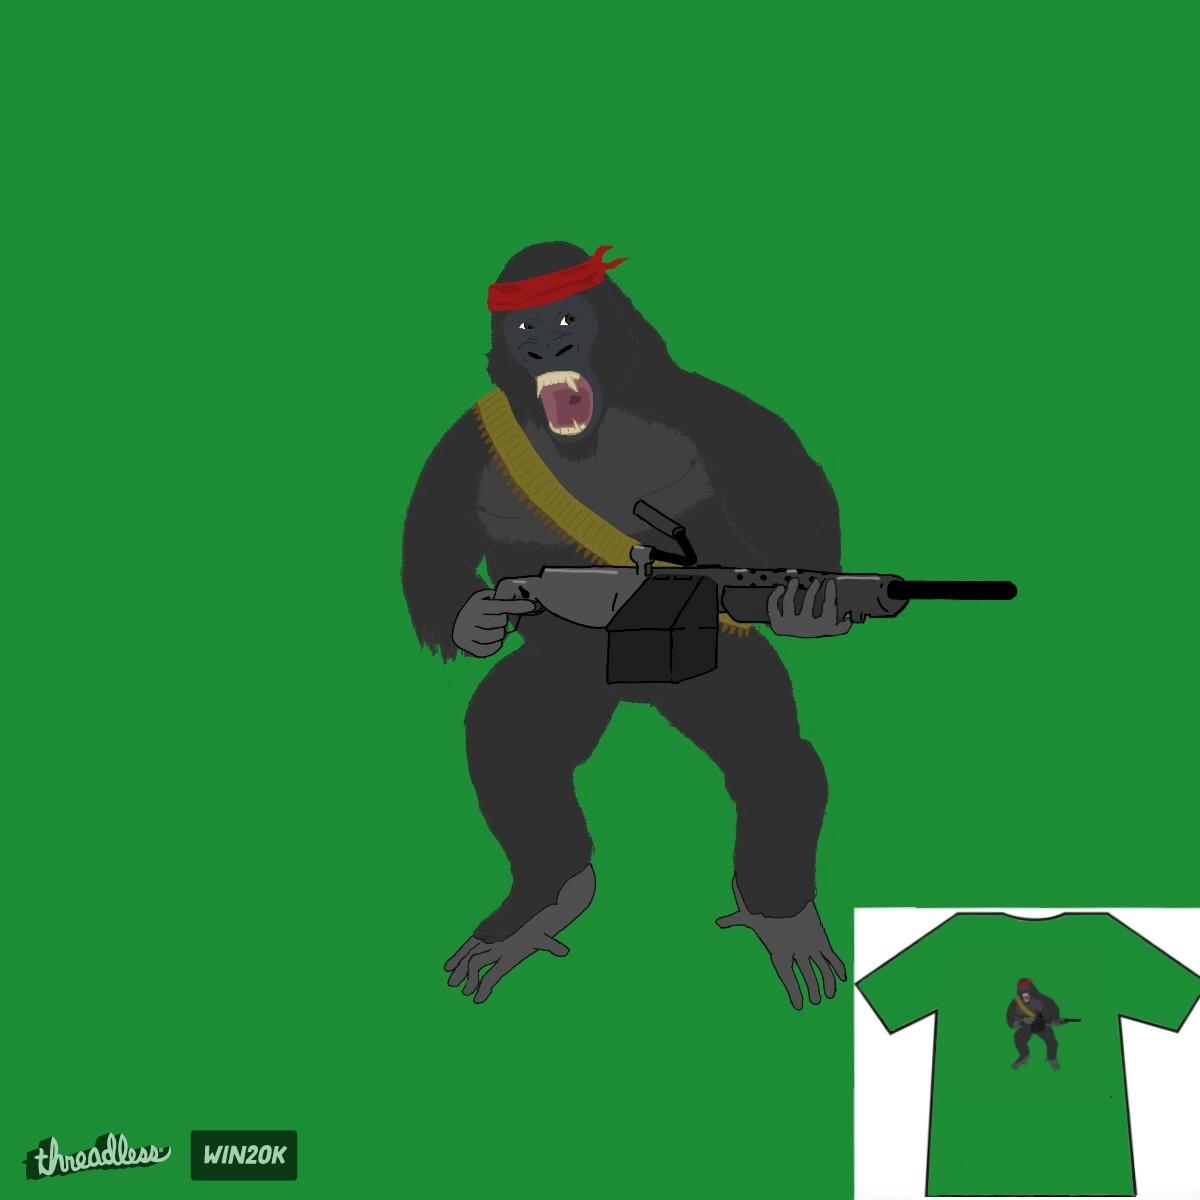 Gorilla Warfare by Tetrastych on Threadless